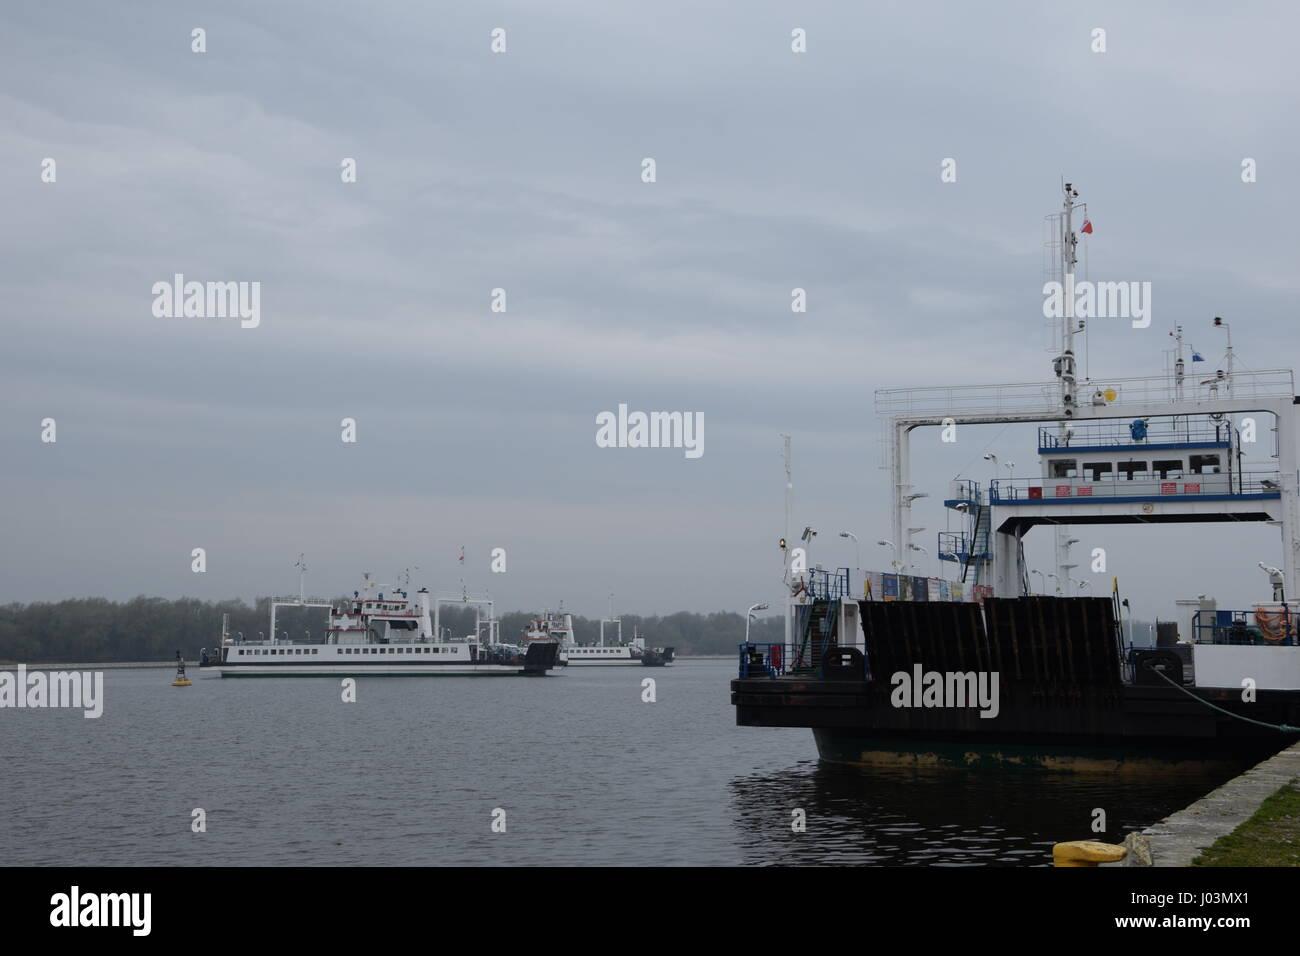 Car ferries across Swina river to Swinoujscie in Poland Stock Photo